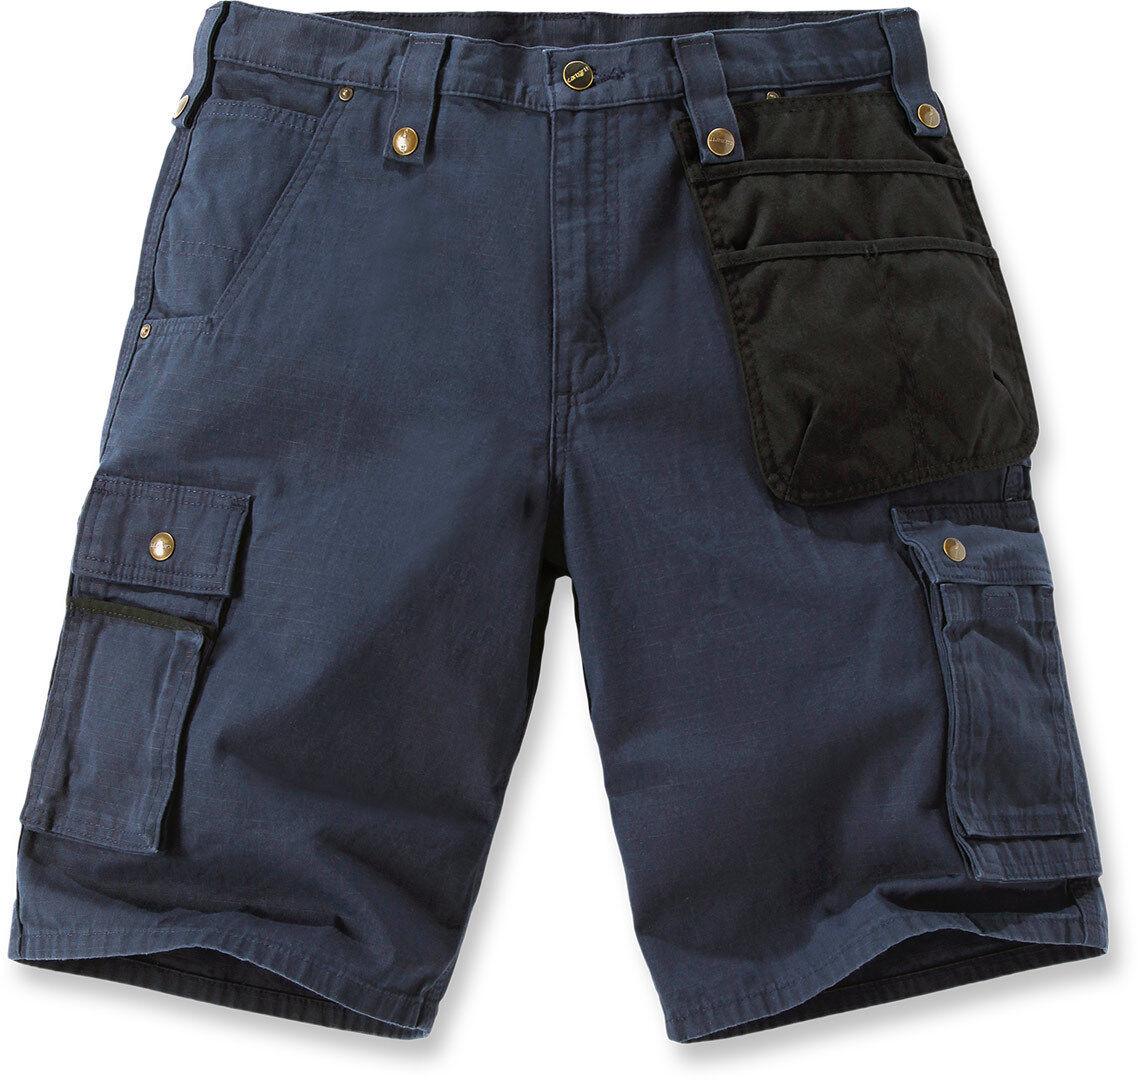 Carhartt Multi Pocket Ripstop Pantalones cortos Azul 28